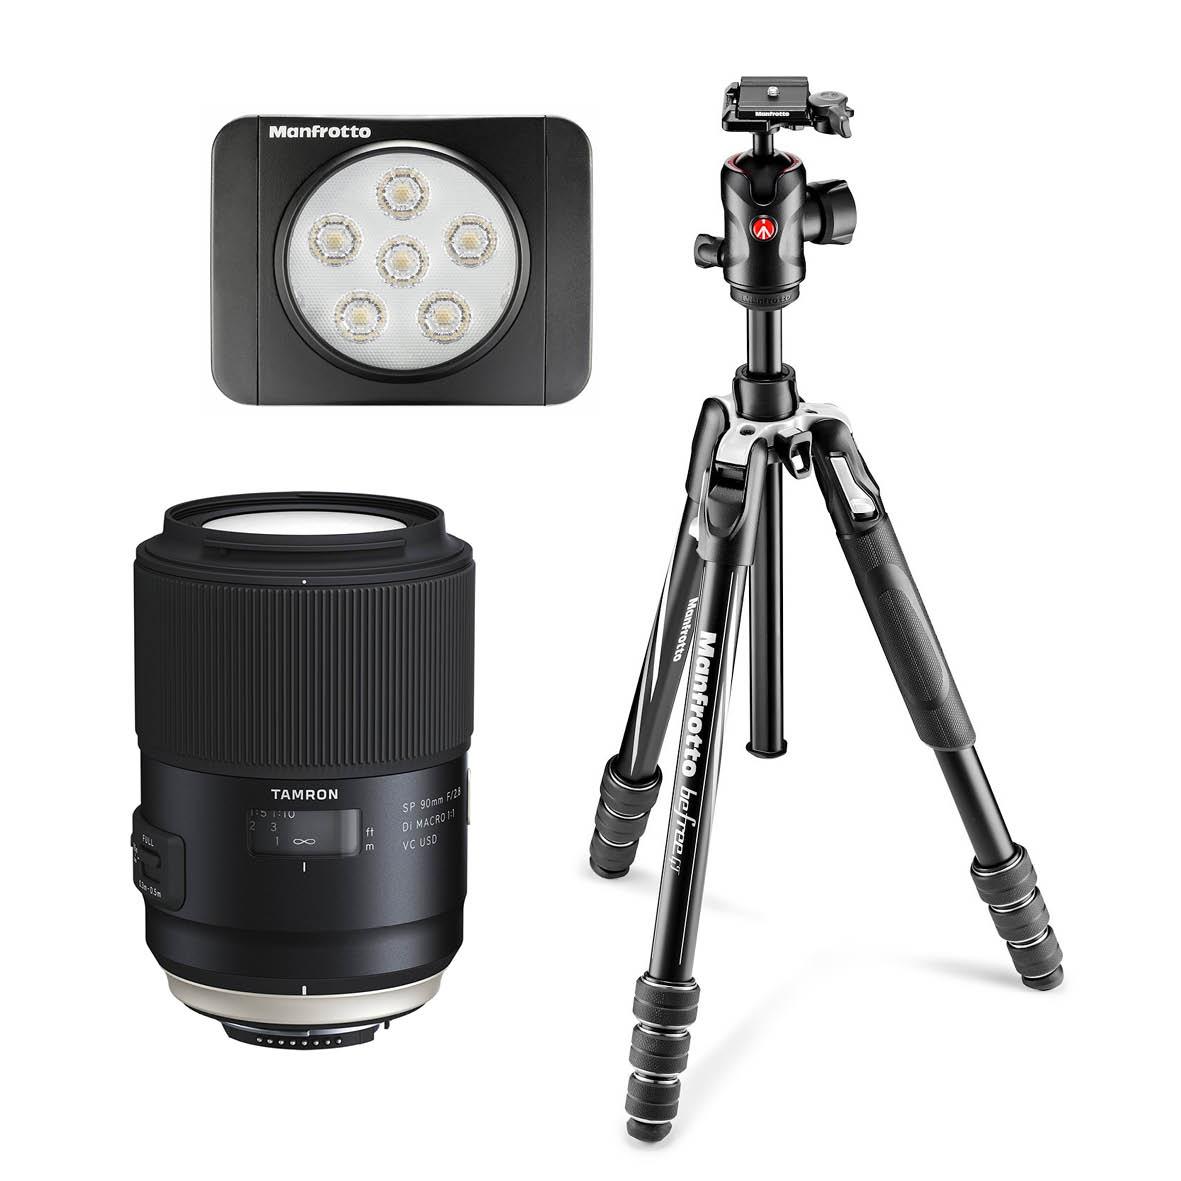 Macro - Sponsored by TamronFirst: Tamron SP 90mm f/2.8 Di VC USD Macro lens, worth $1499Second: Manfrotto Befree GT Aluminium Travel Twist Tripod, worth $499Third: Lumi Art LED Light, worth $139